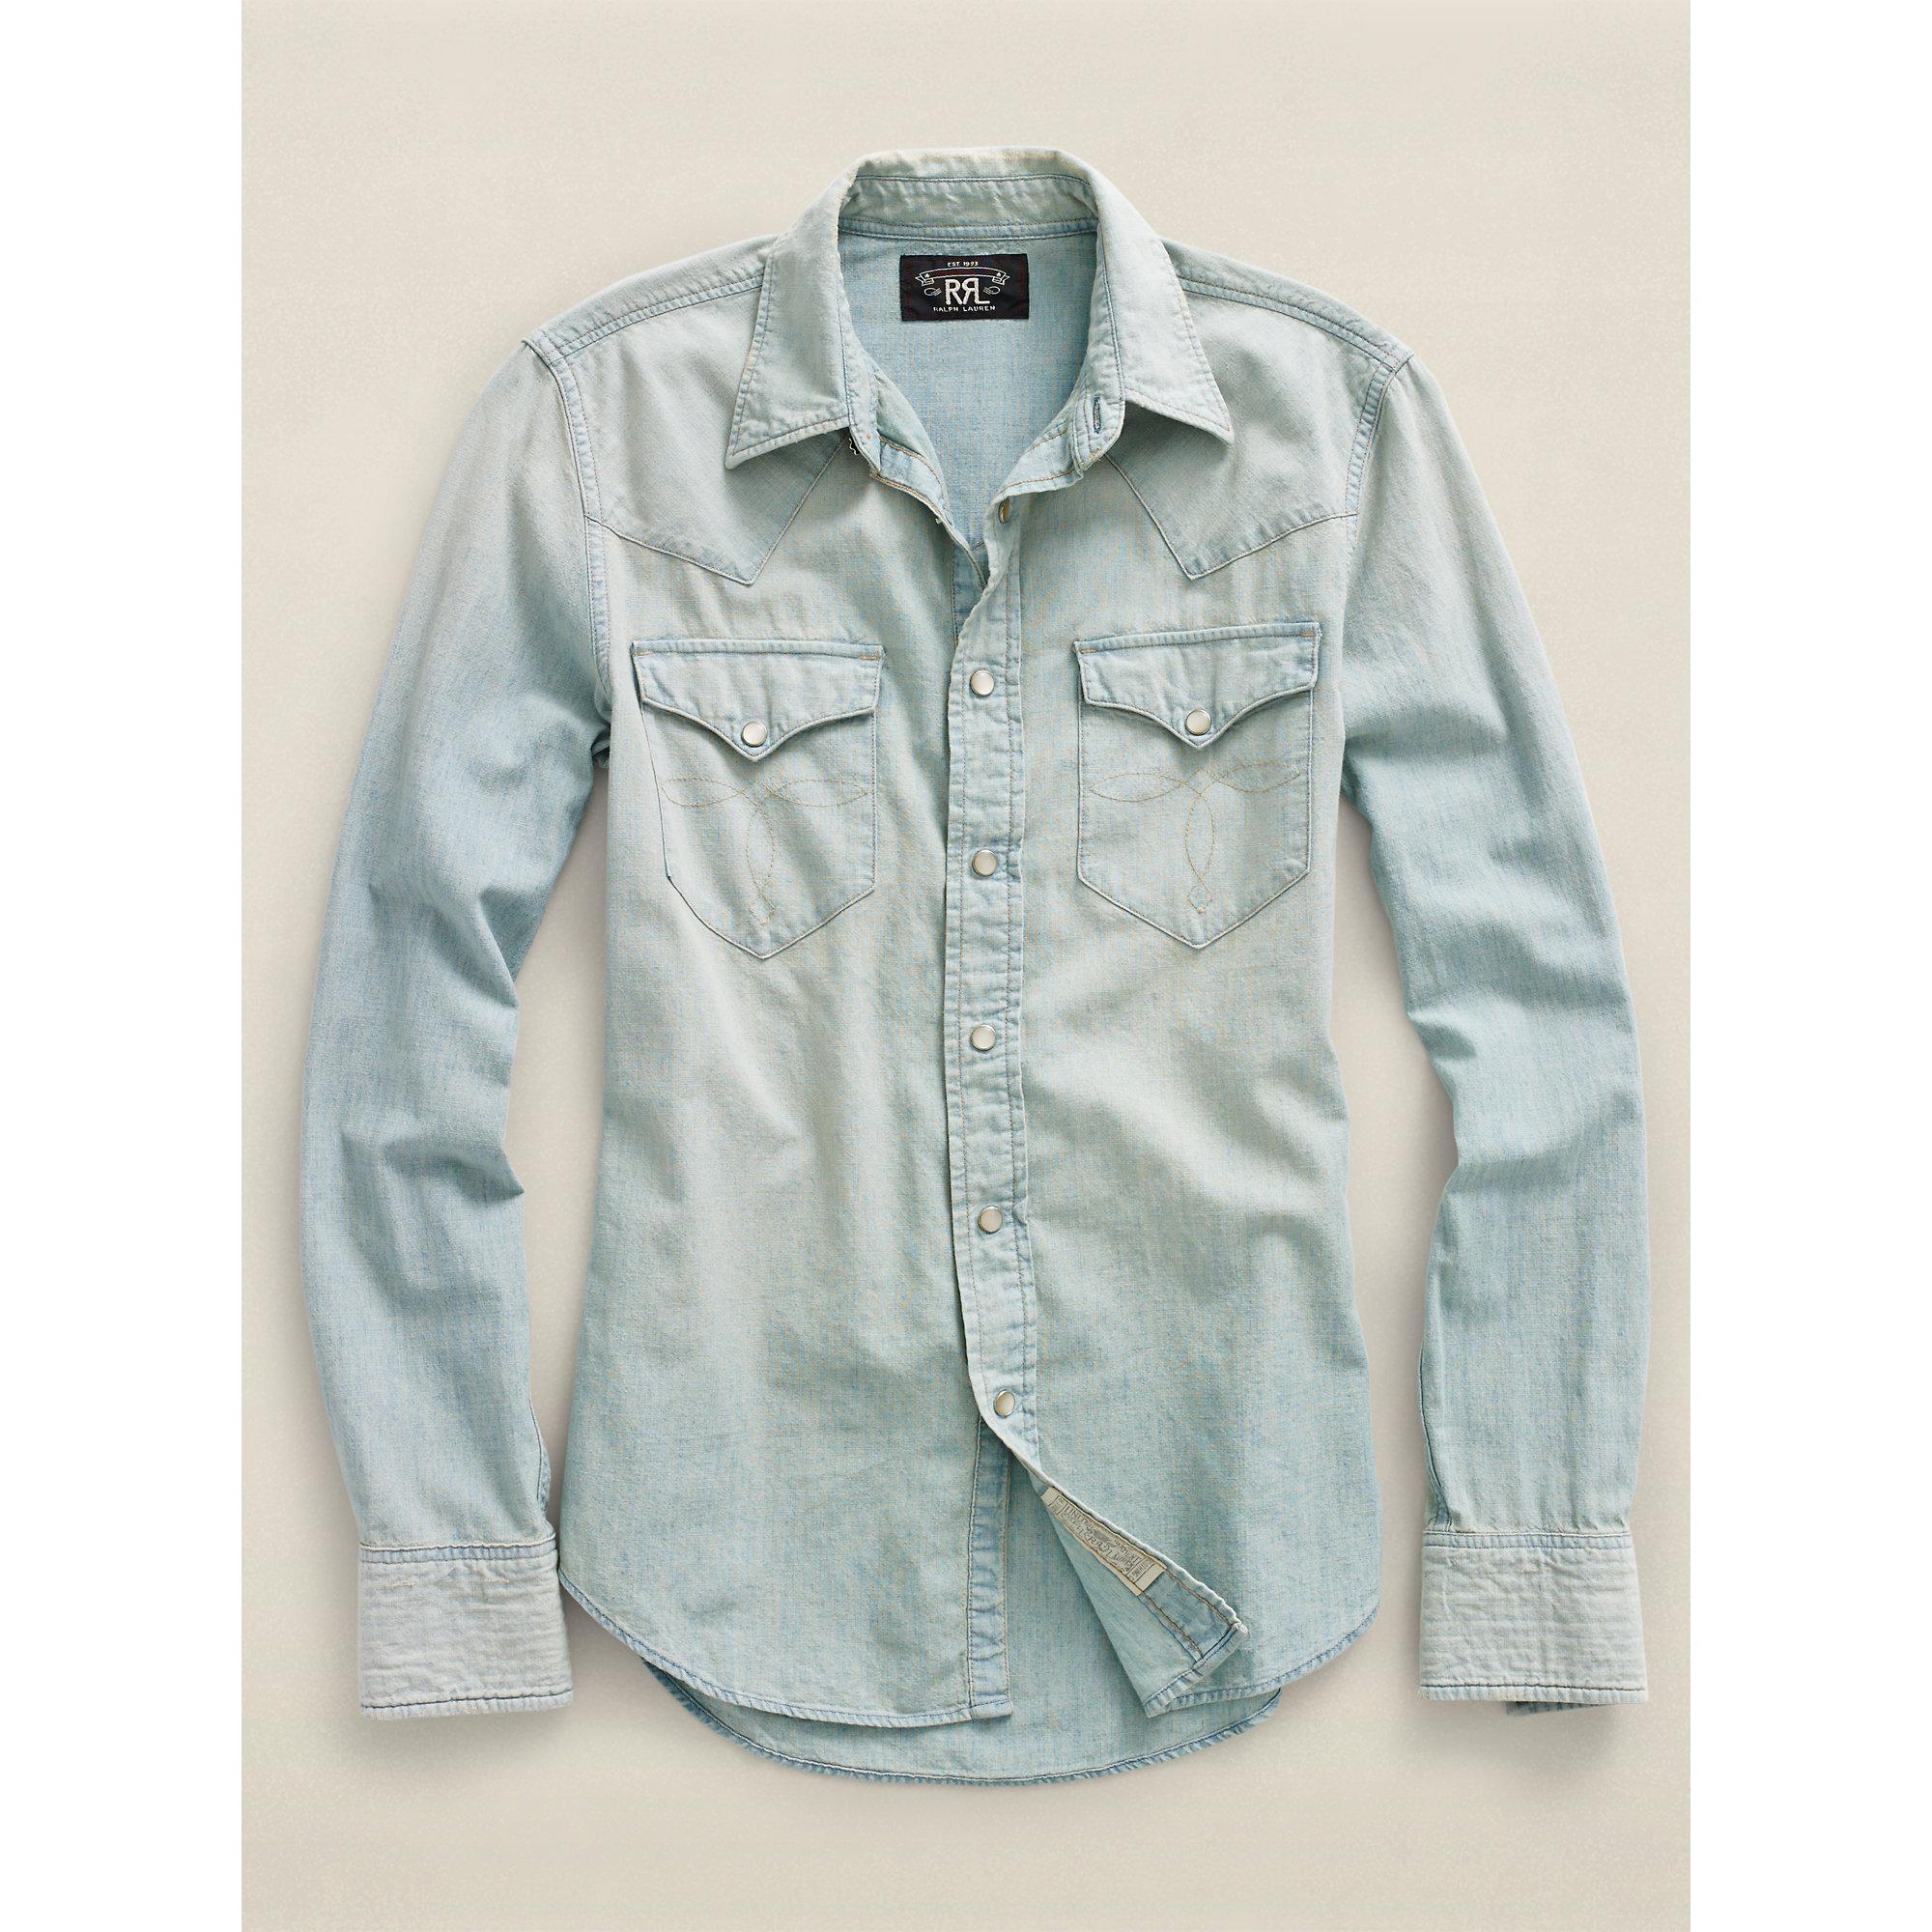 37a8bdfd5e Lyst - RRL Chambray Buffalo Western Shirt in Blue for Men